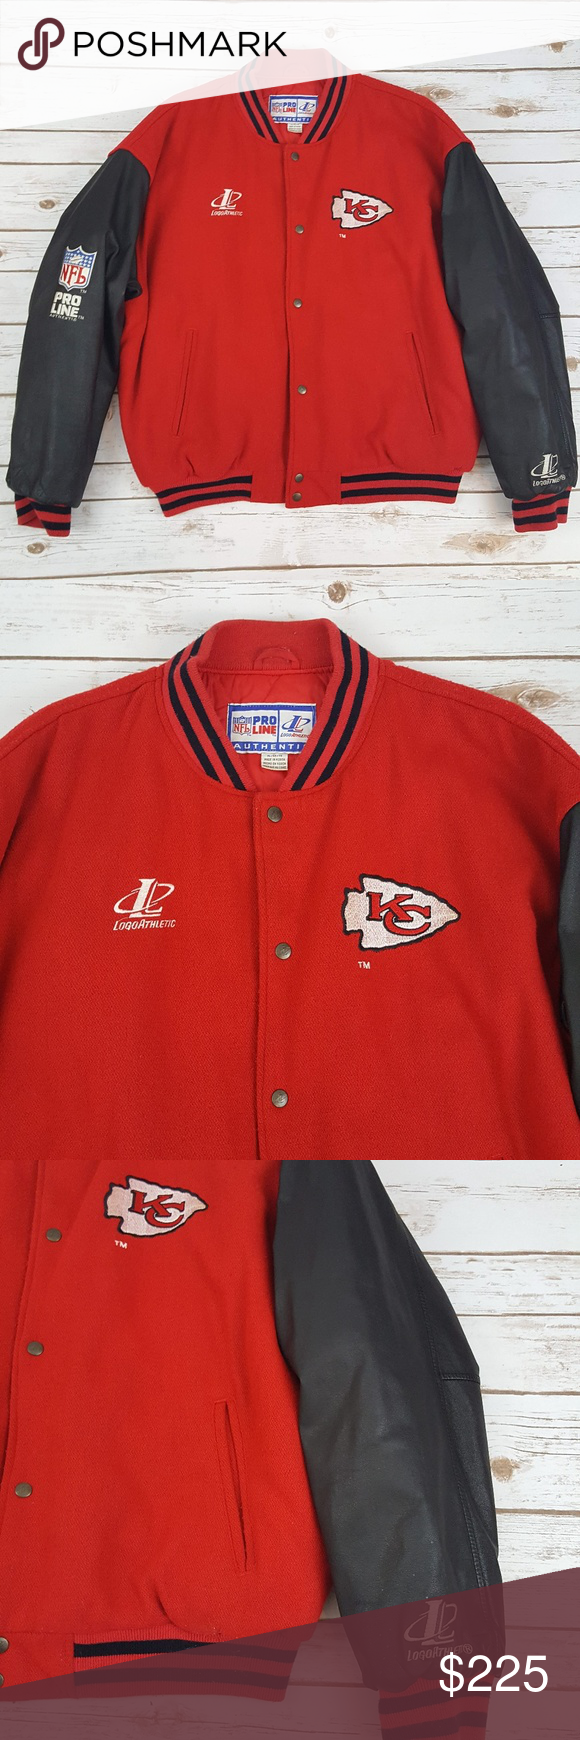 Pro Line Leather Sleeve Kansas City Chiefs Jacket Vintage Nfl Pro Line Authentic Leather Sleeve Kc Kansas City Chiefs Jacke Line Jackets Leather Sleeve Jackets [ 1740 x 580 Pixel ]